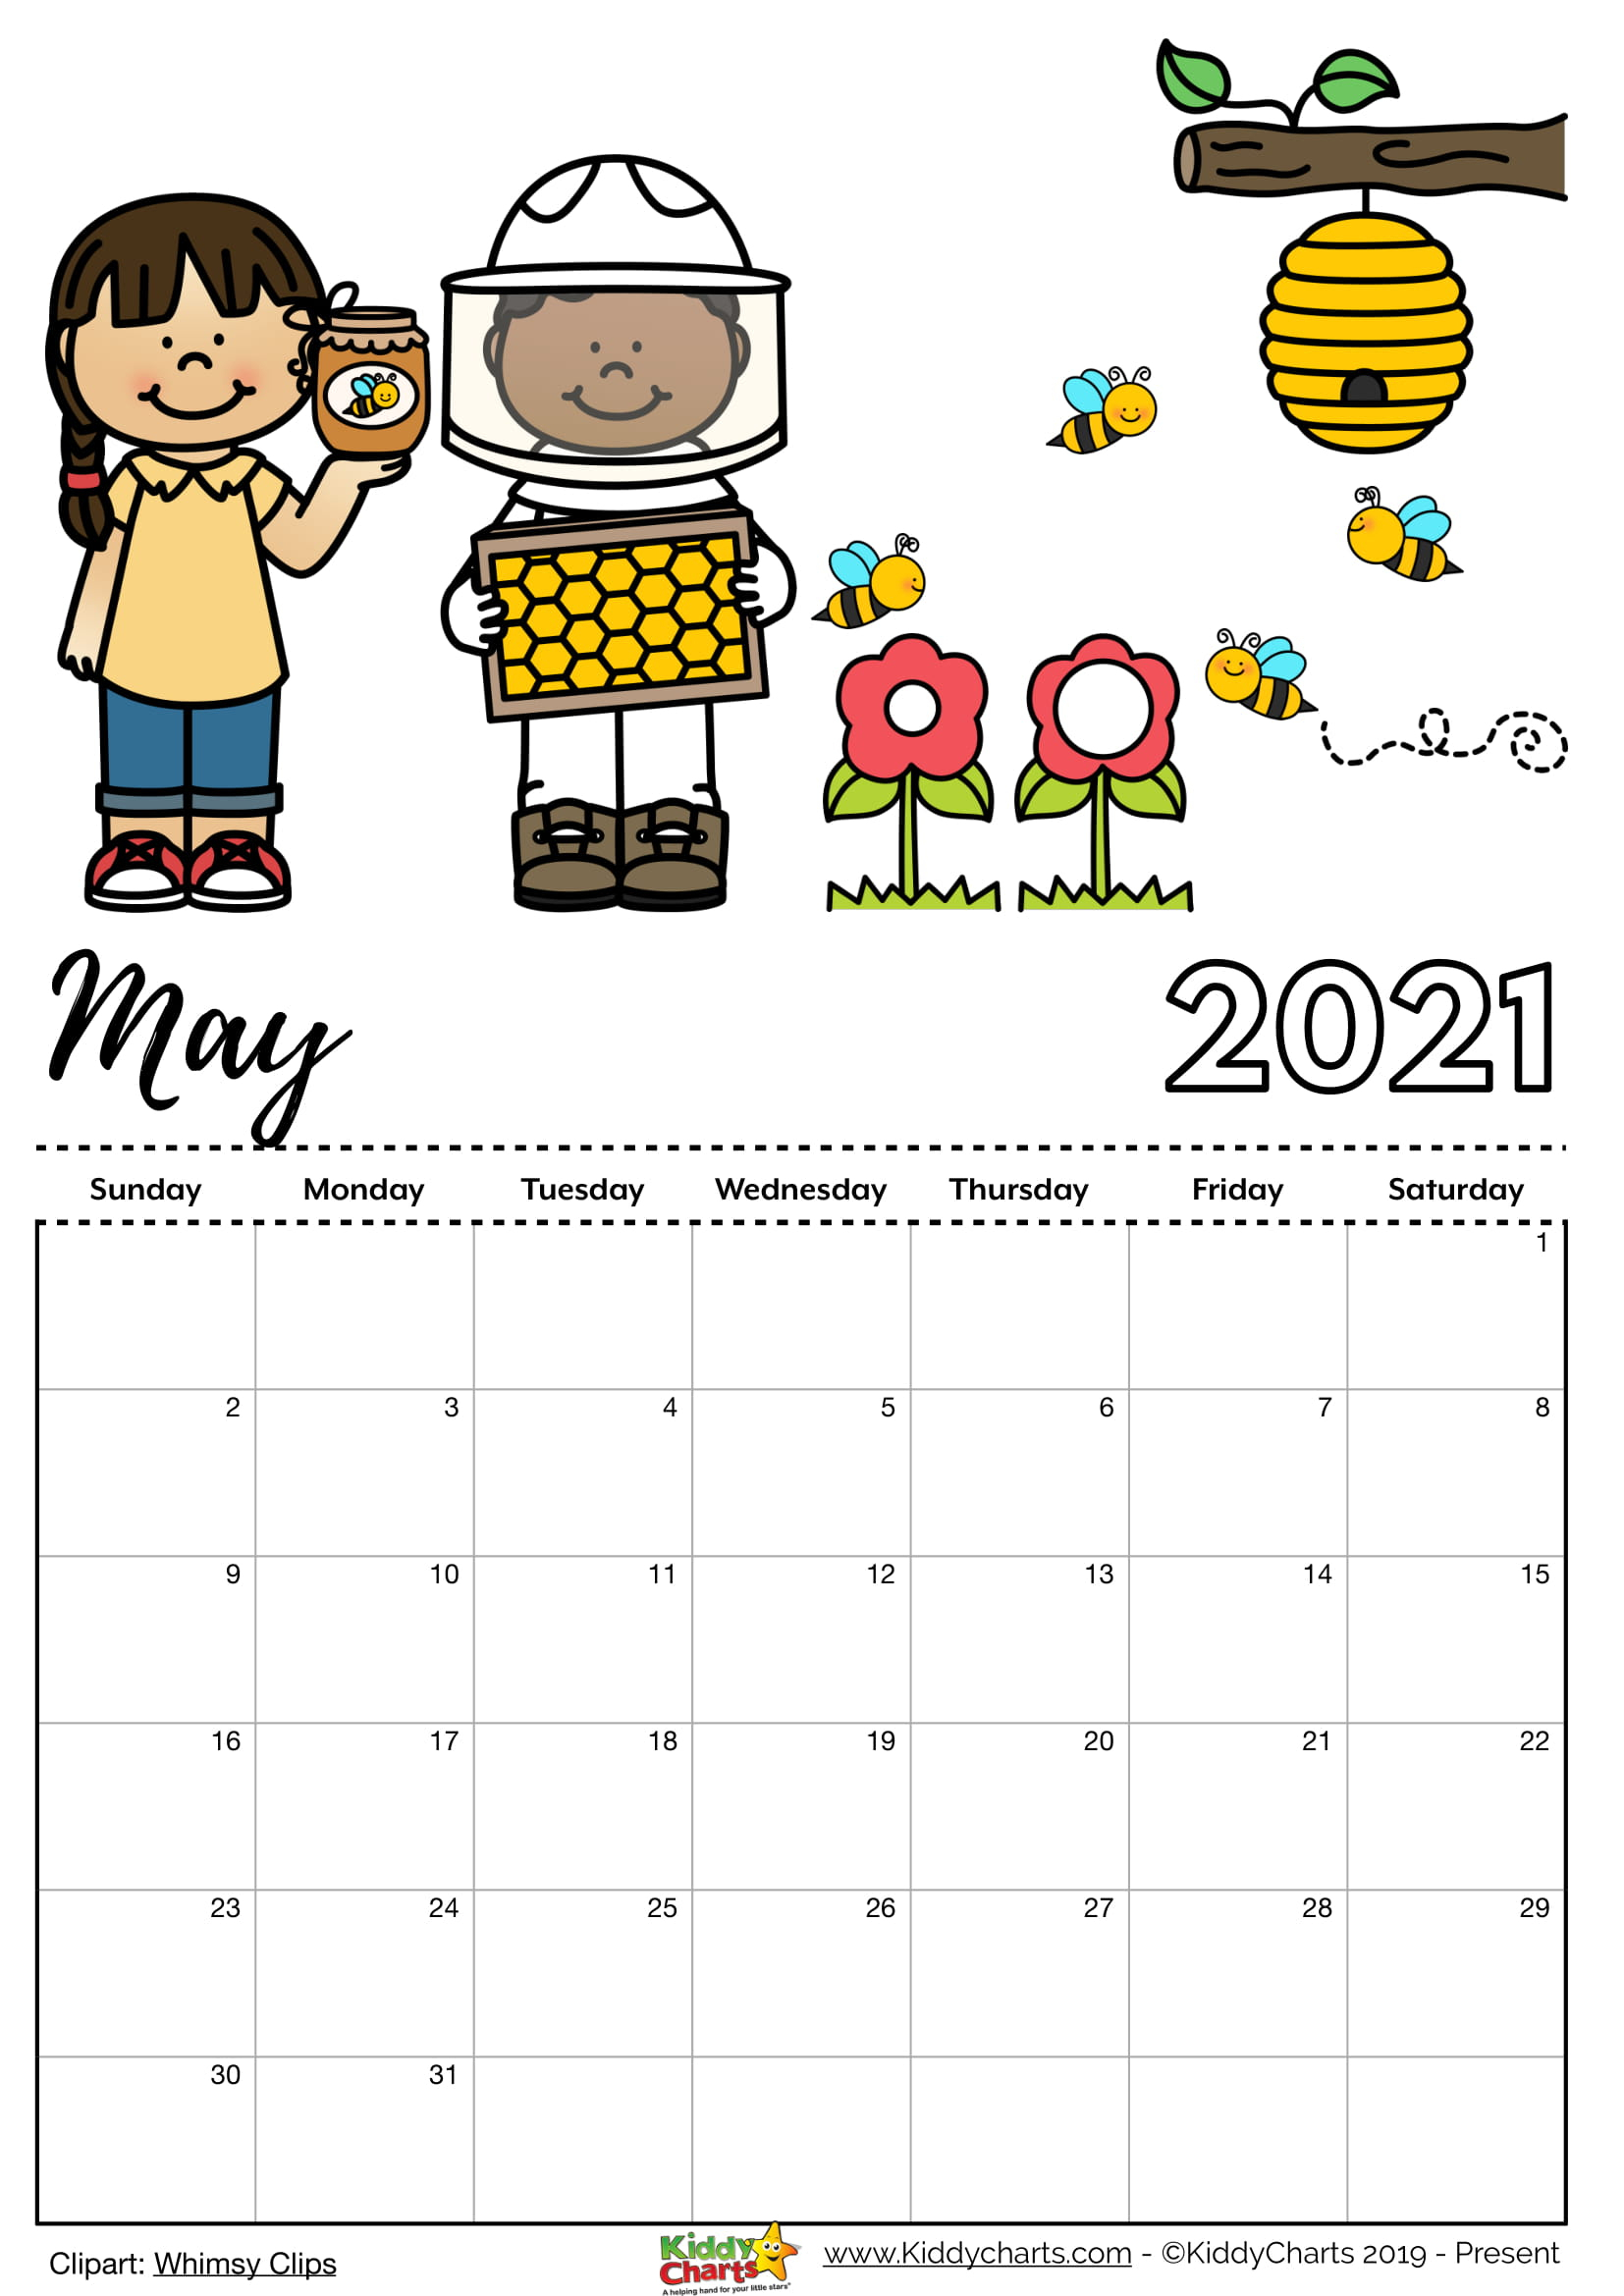 Free Printable 2021 Calendar Includes Editable Version